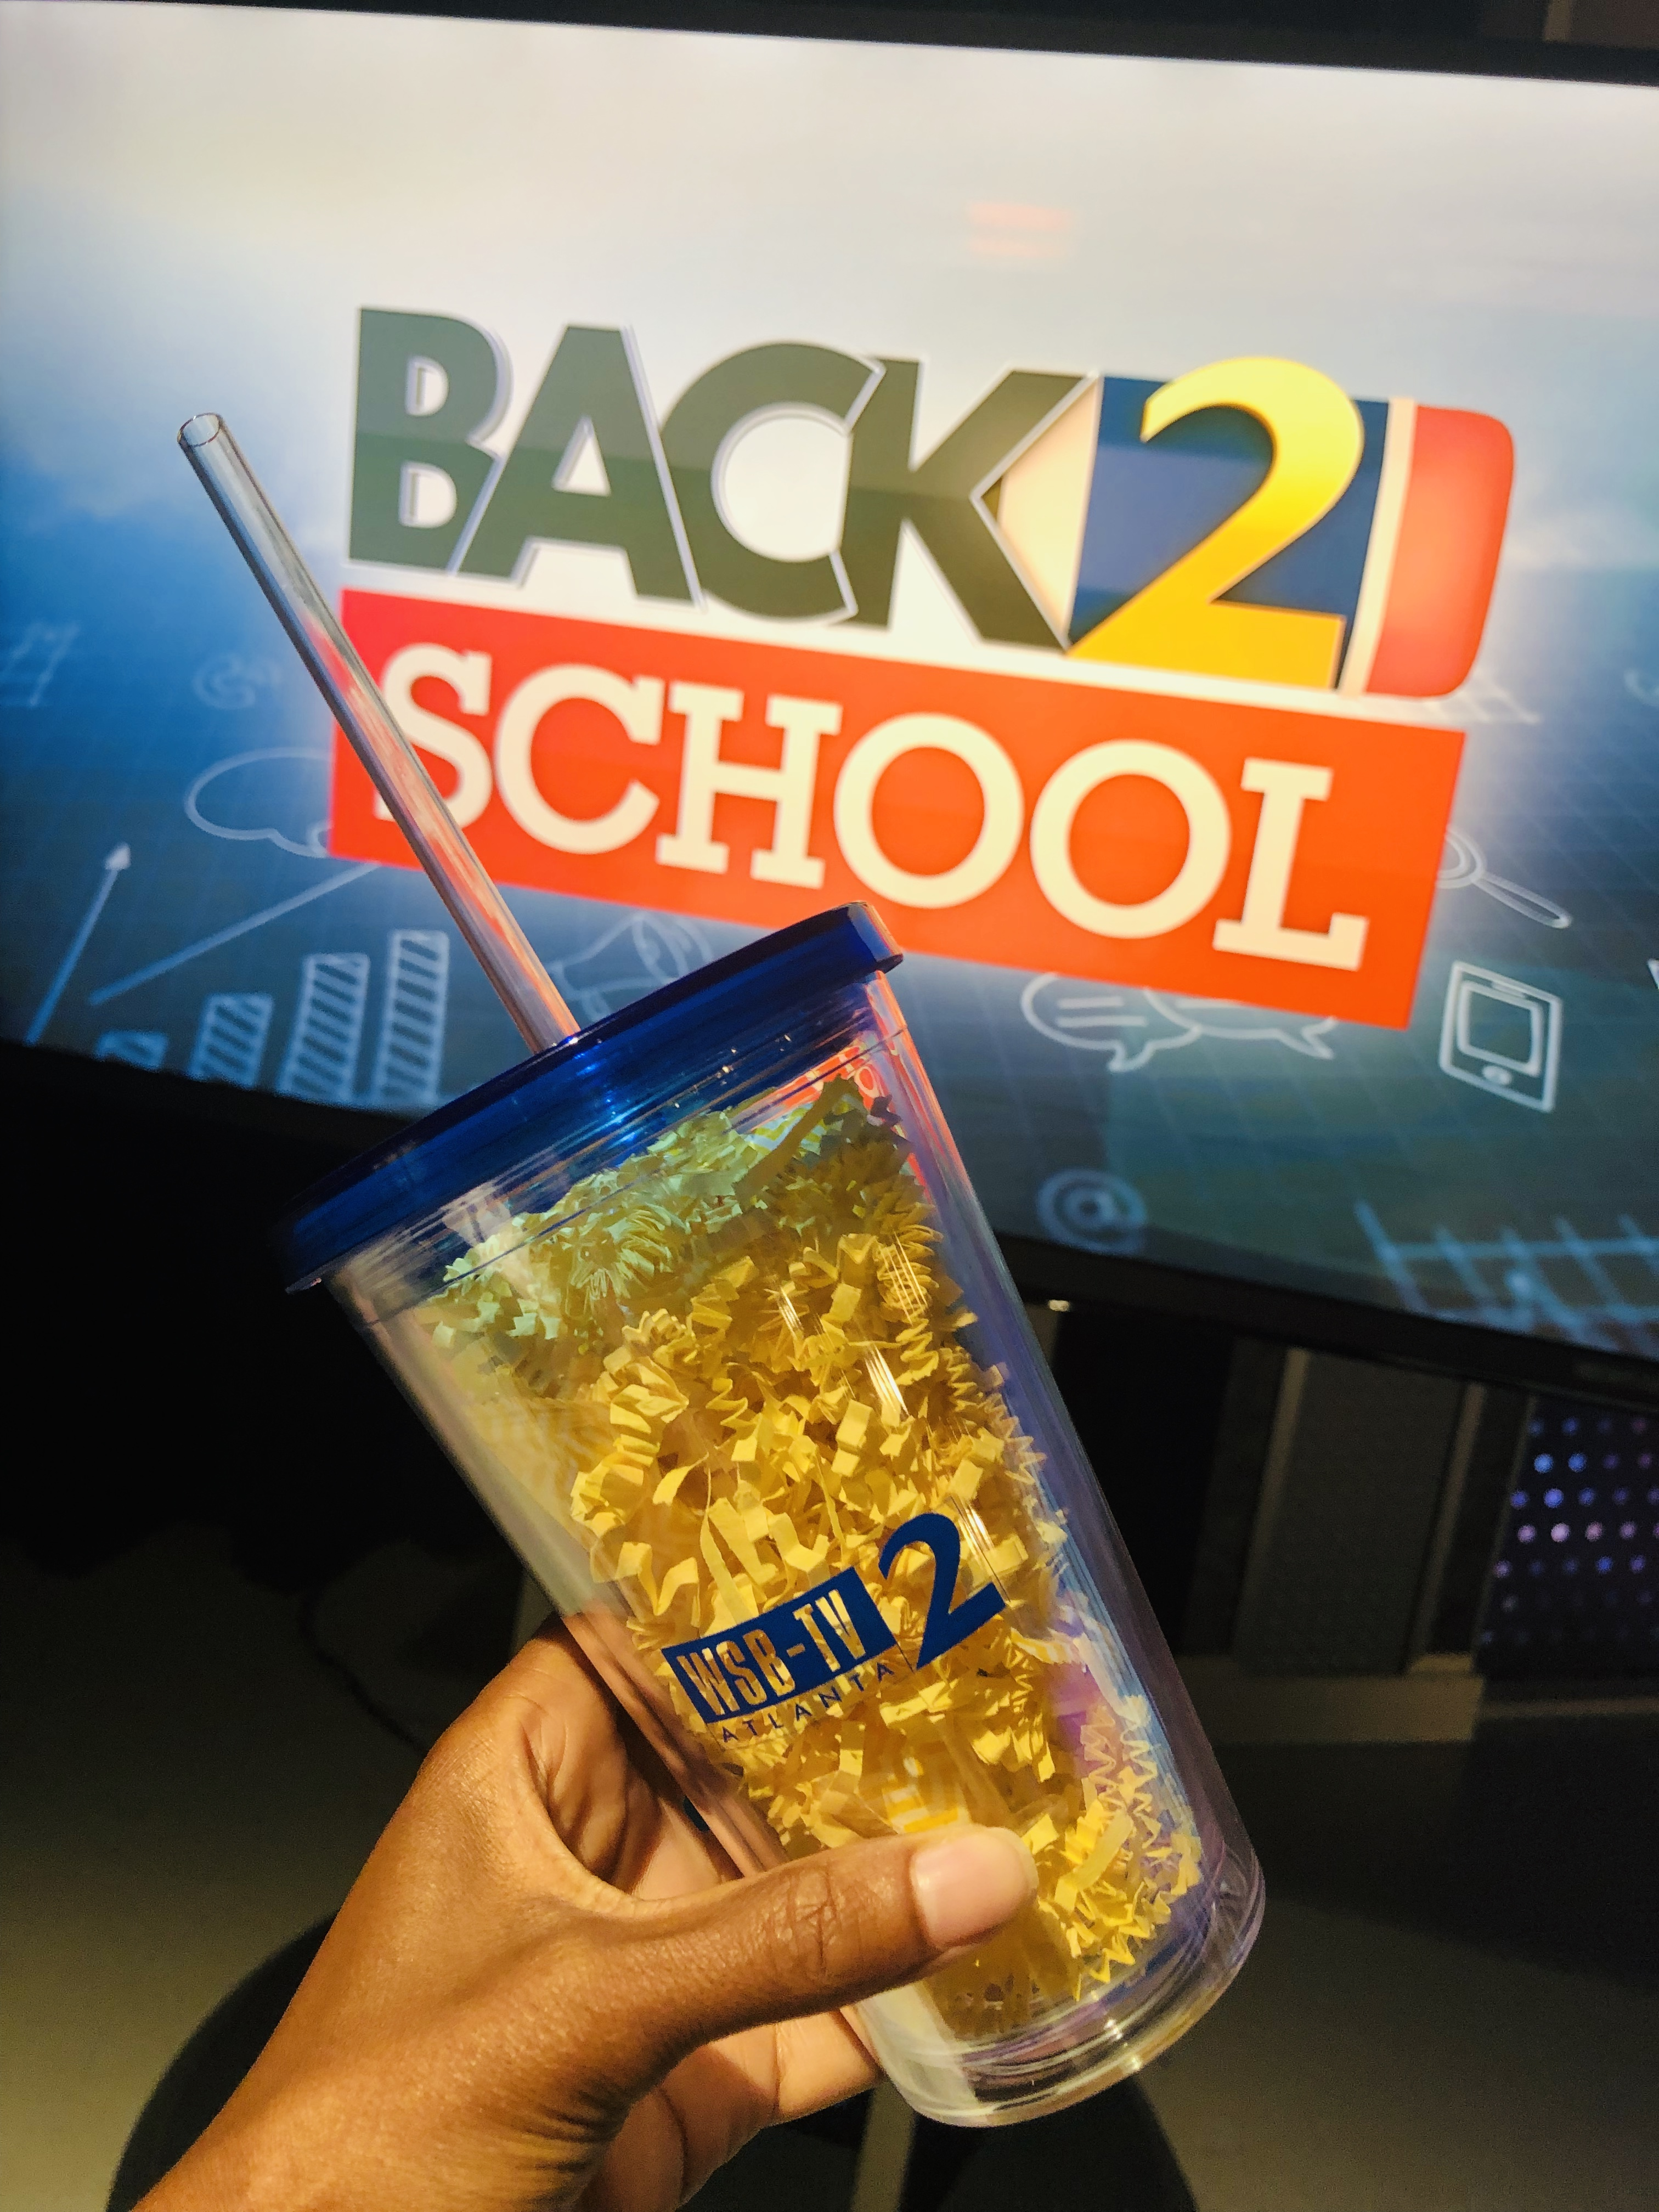 WSB-TV Back 2 School Agenda, Meet & Greet, Panel Discussion